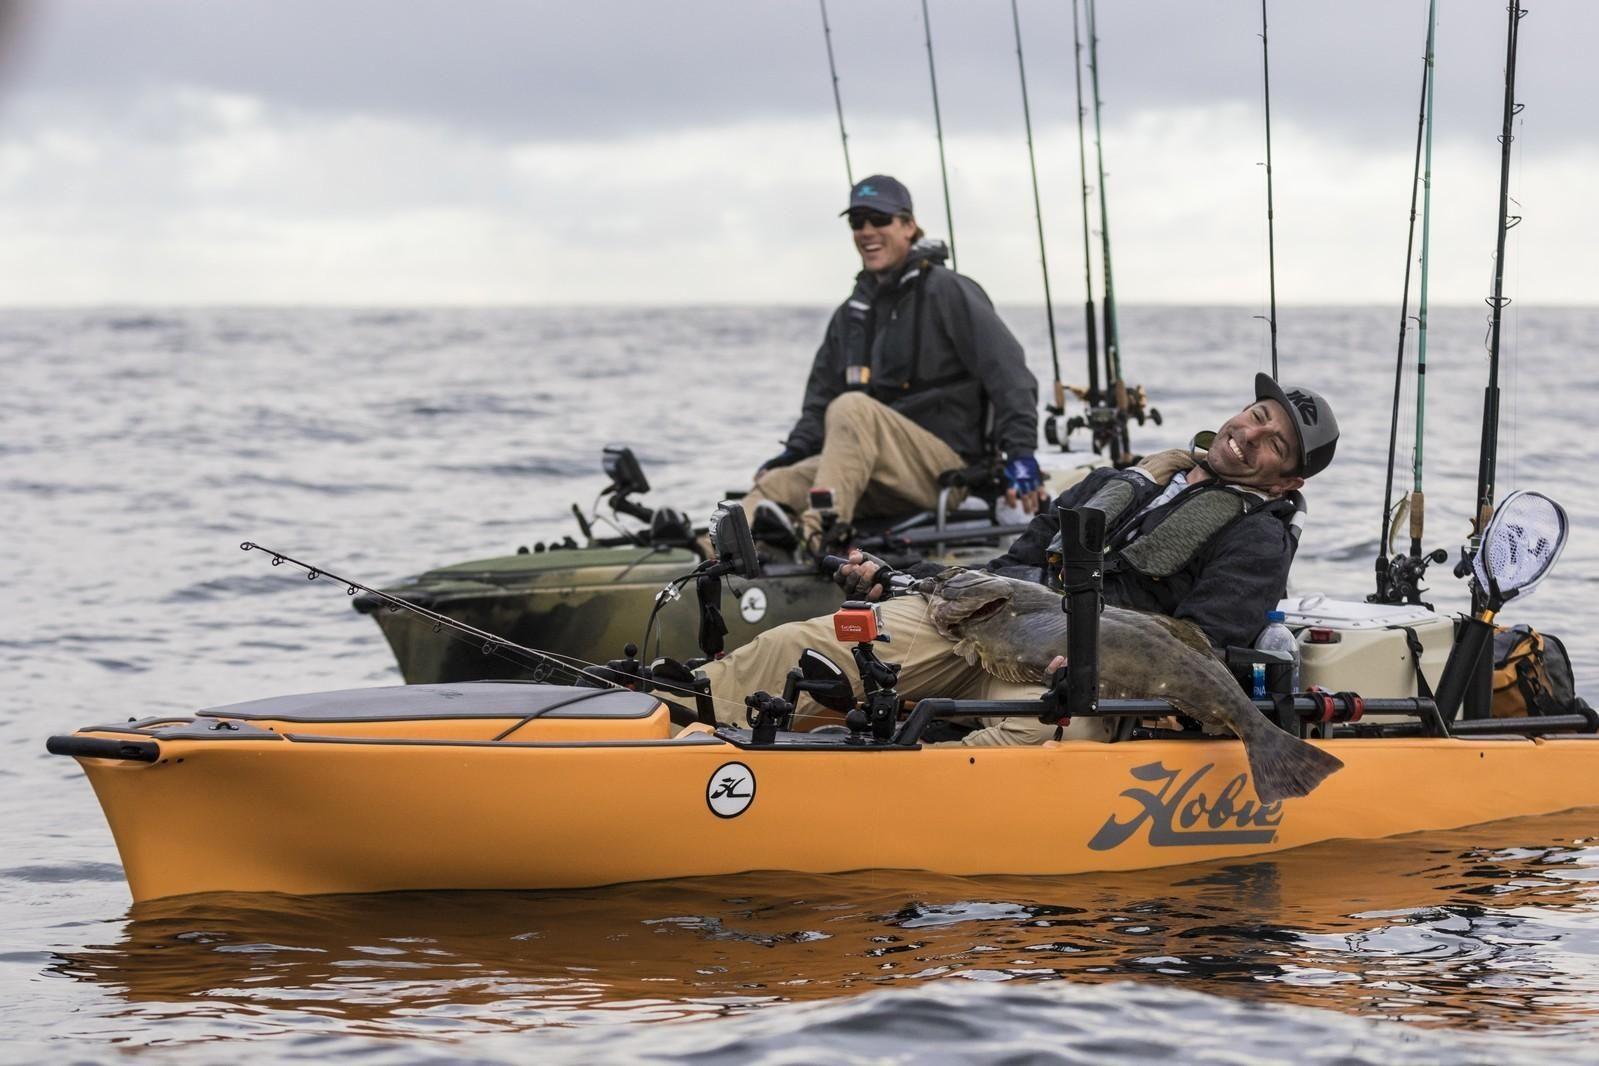 2019 Hobie Mirage Pro Angler 14 Power Boat For Sale Www